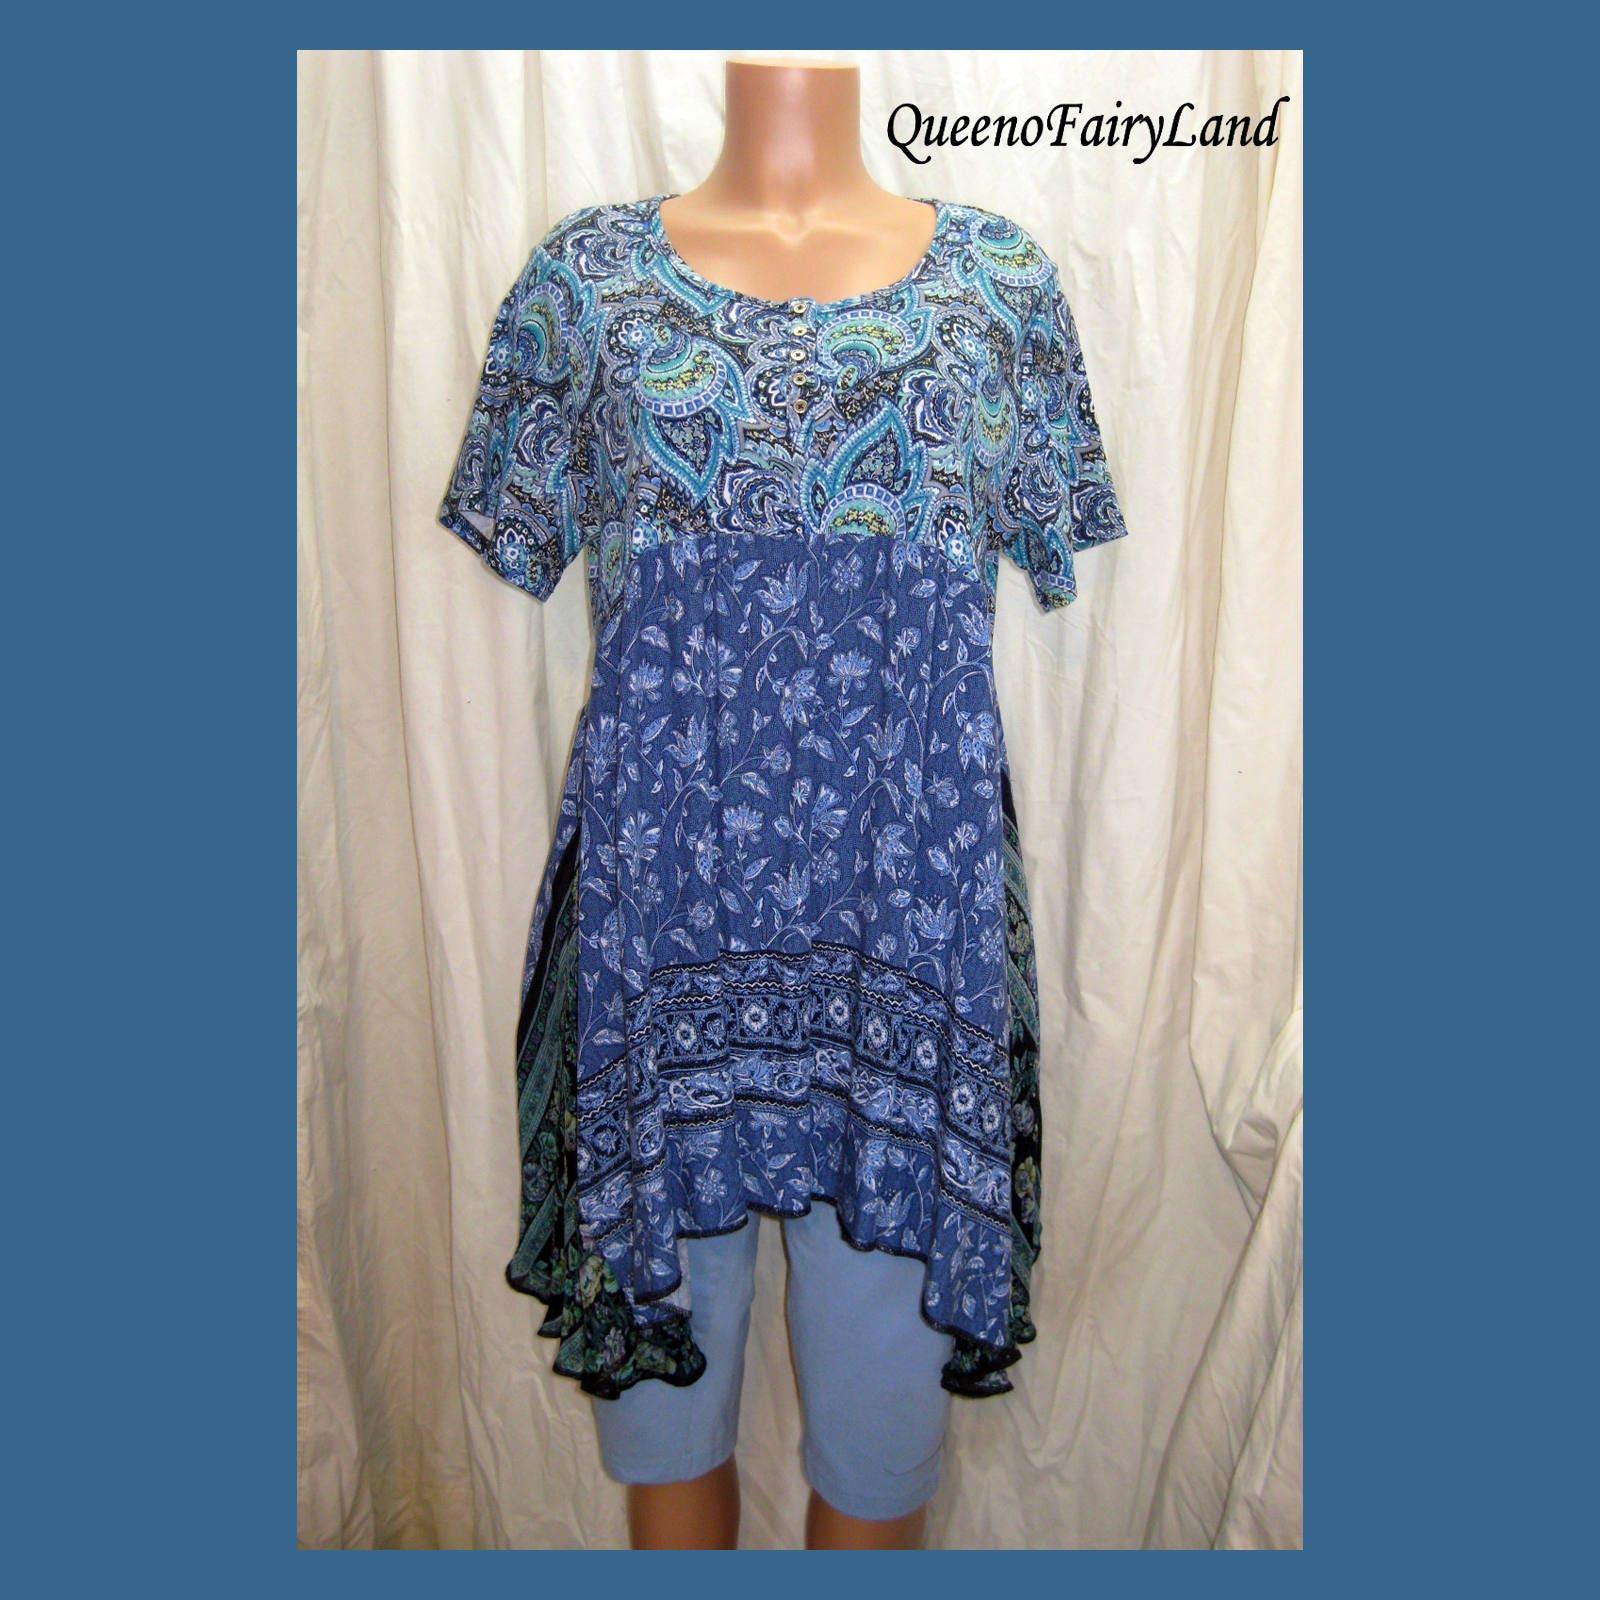 Bohemian Paisley Blues Tunic Dress Bust 42 Size XL 1X Re purposed